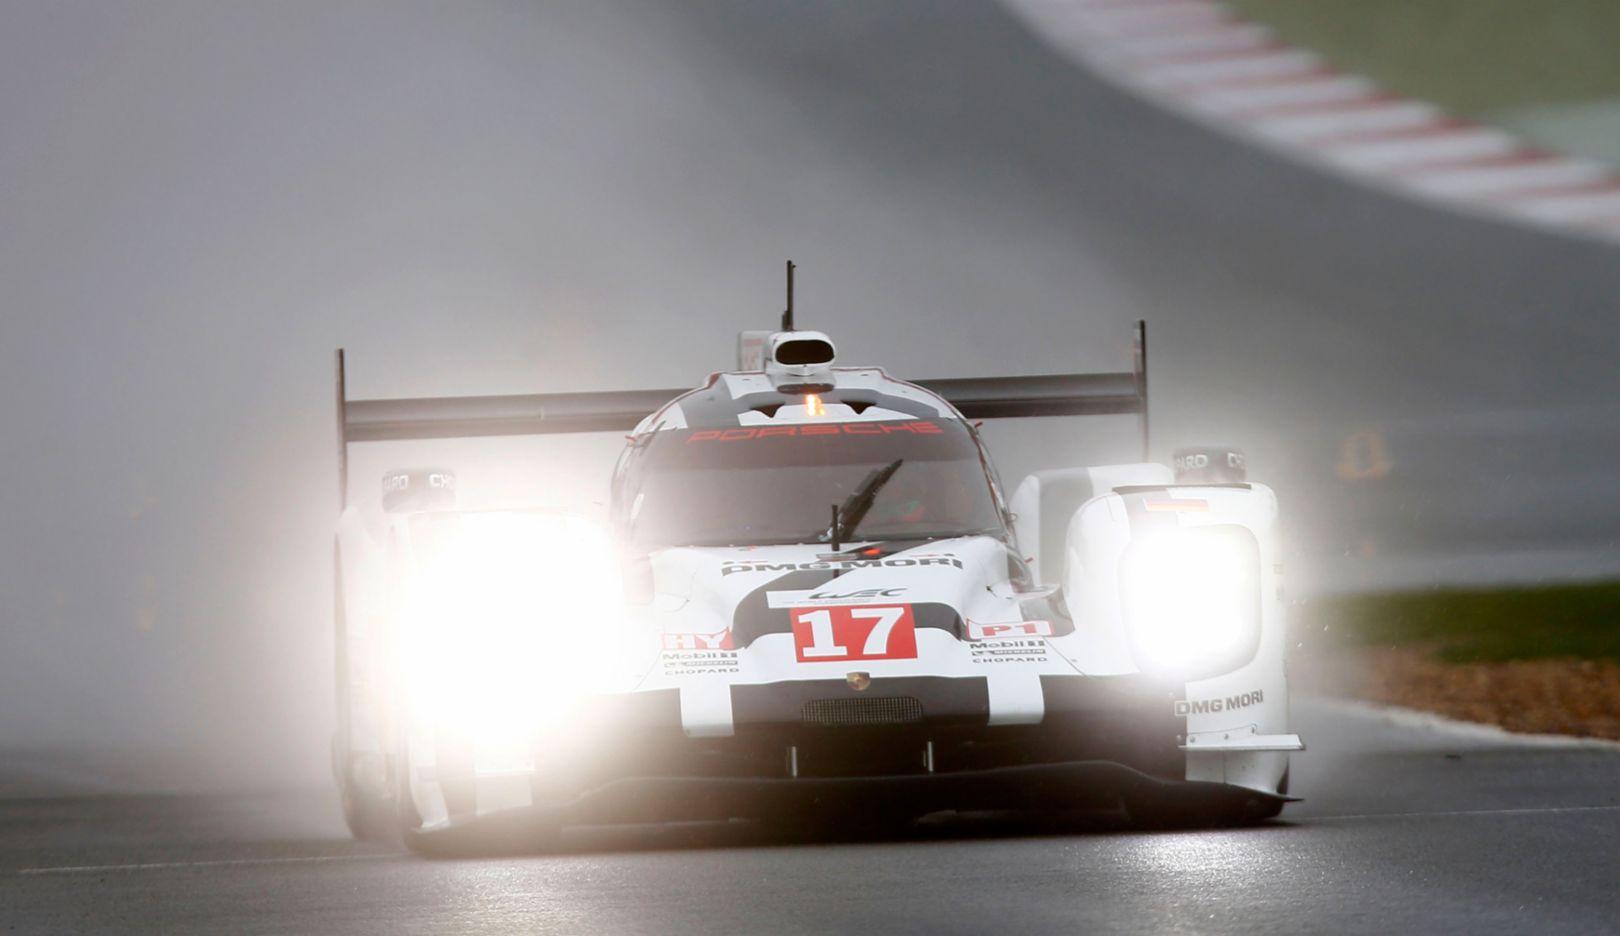 Porsche 919 Hybrid, Porsche Team, Silverstone 2015, Porsche AG